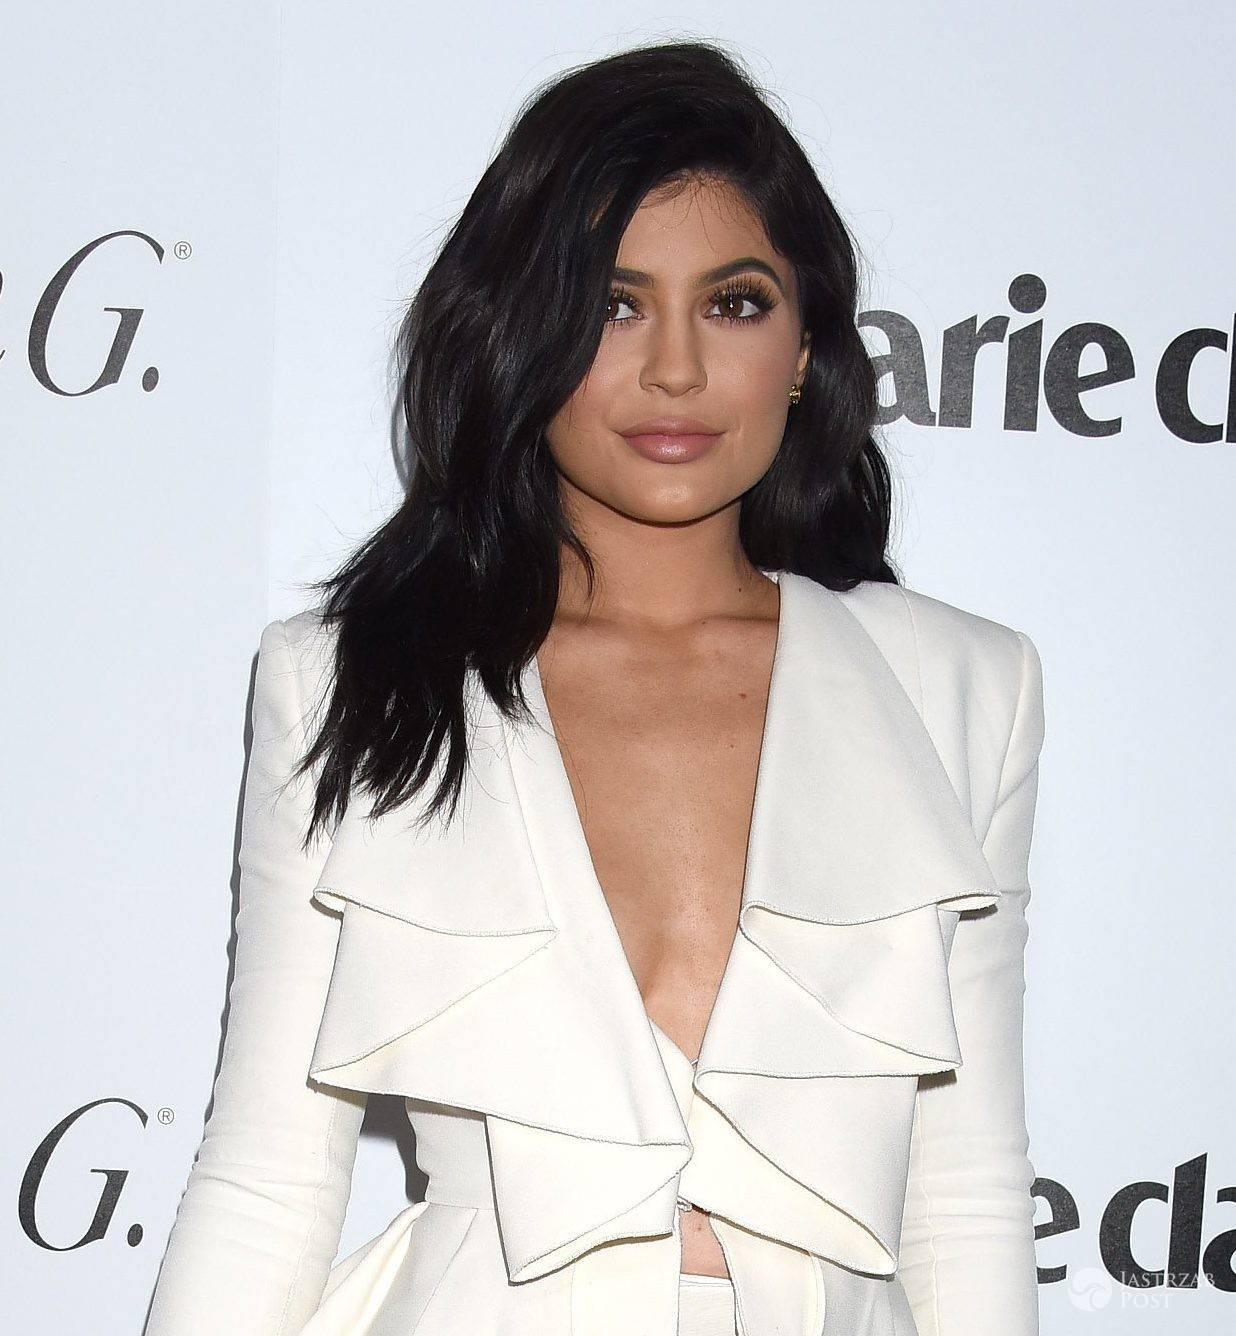 Kylie Jenner (fot. ONS)